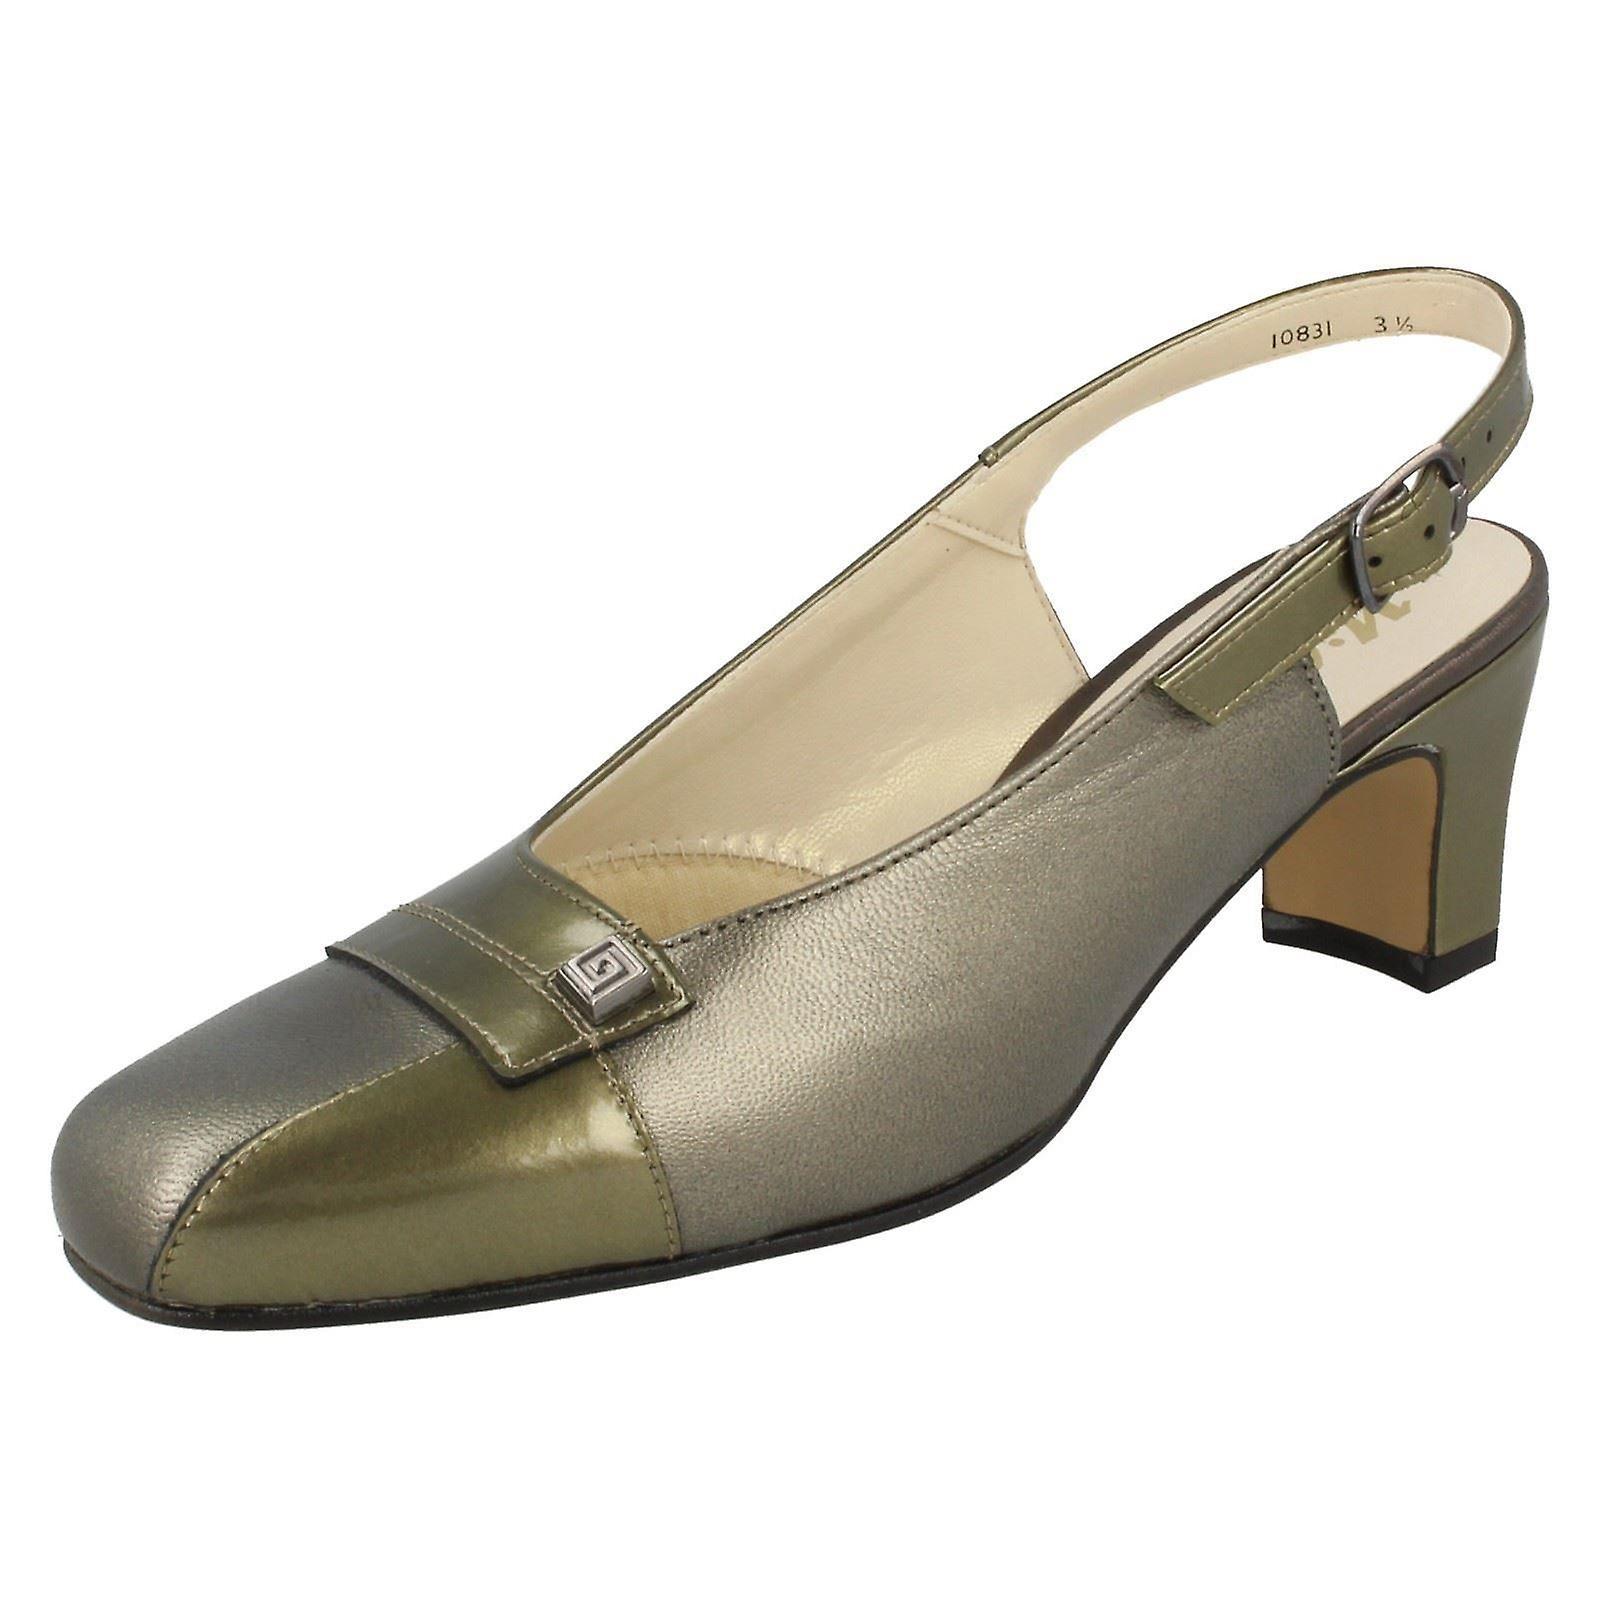 f8e6c1aa012 Ladies Nil Simile Narrow Fitting Slingback Shoes Delaware